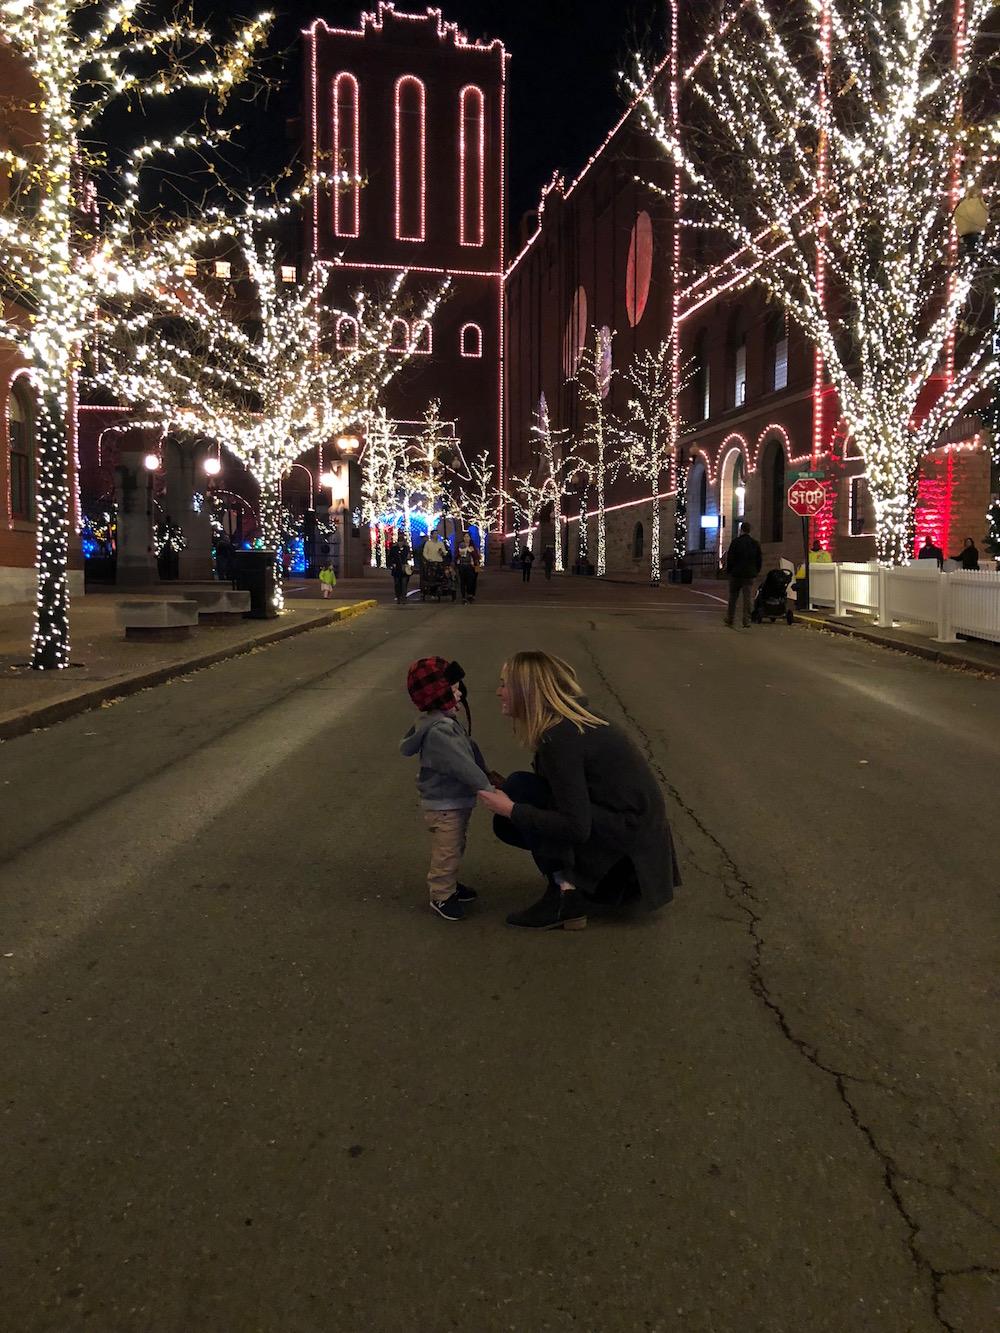 Brewery Lights at Anheuser-Busch St. Louis | Ellie And Addie